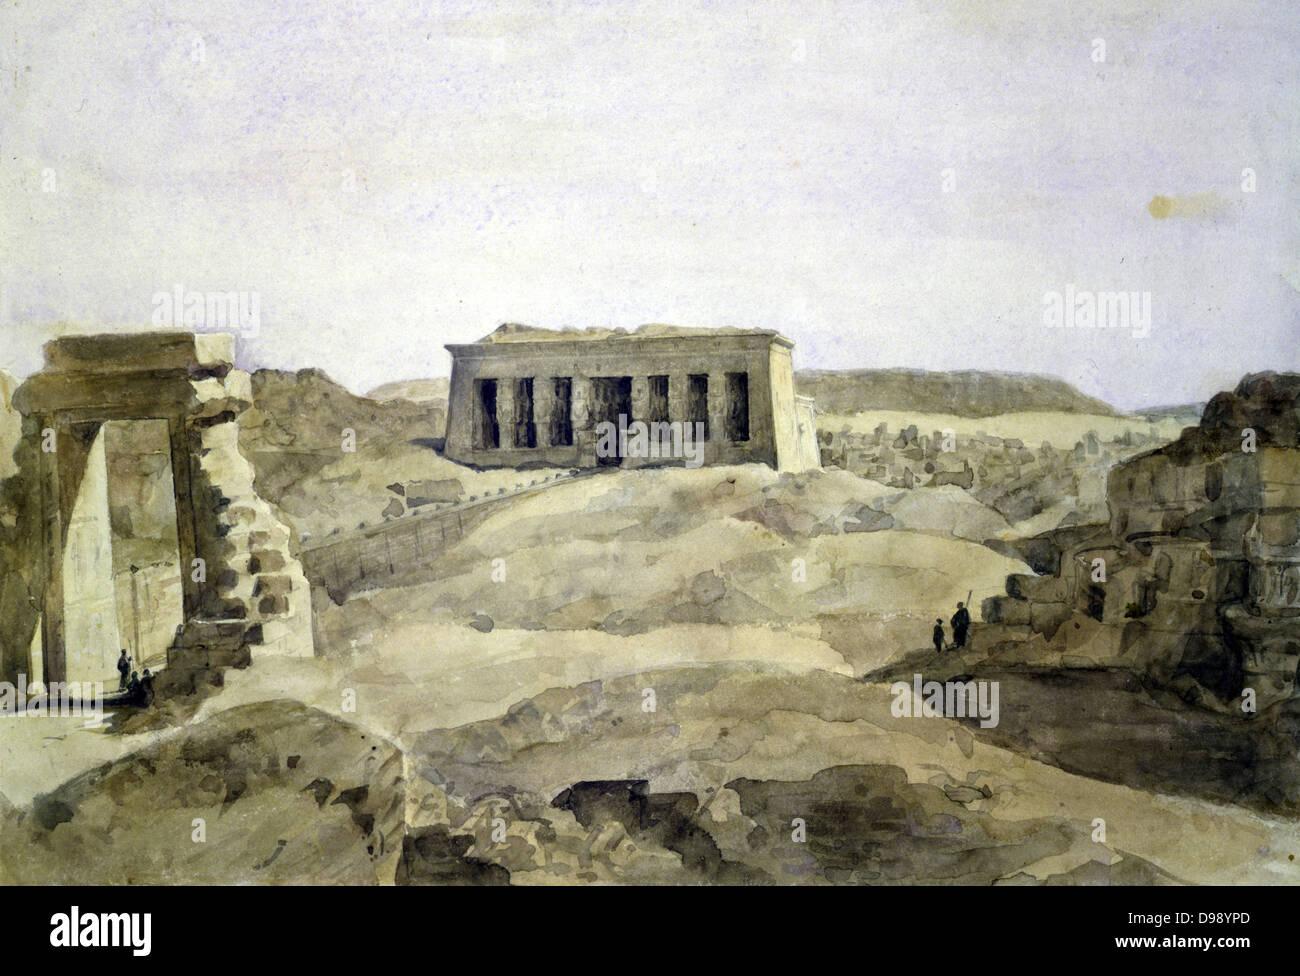 French Architect dendera'. hector horeau (1801-1782) french architect. temple of